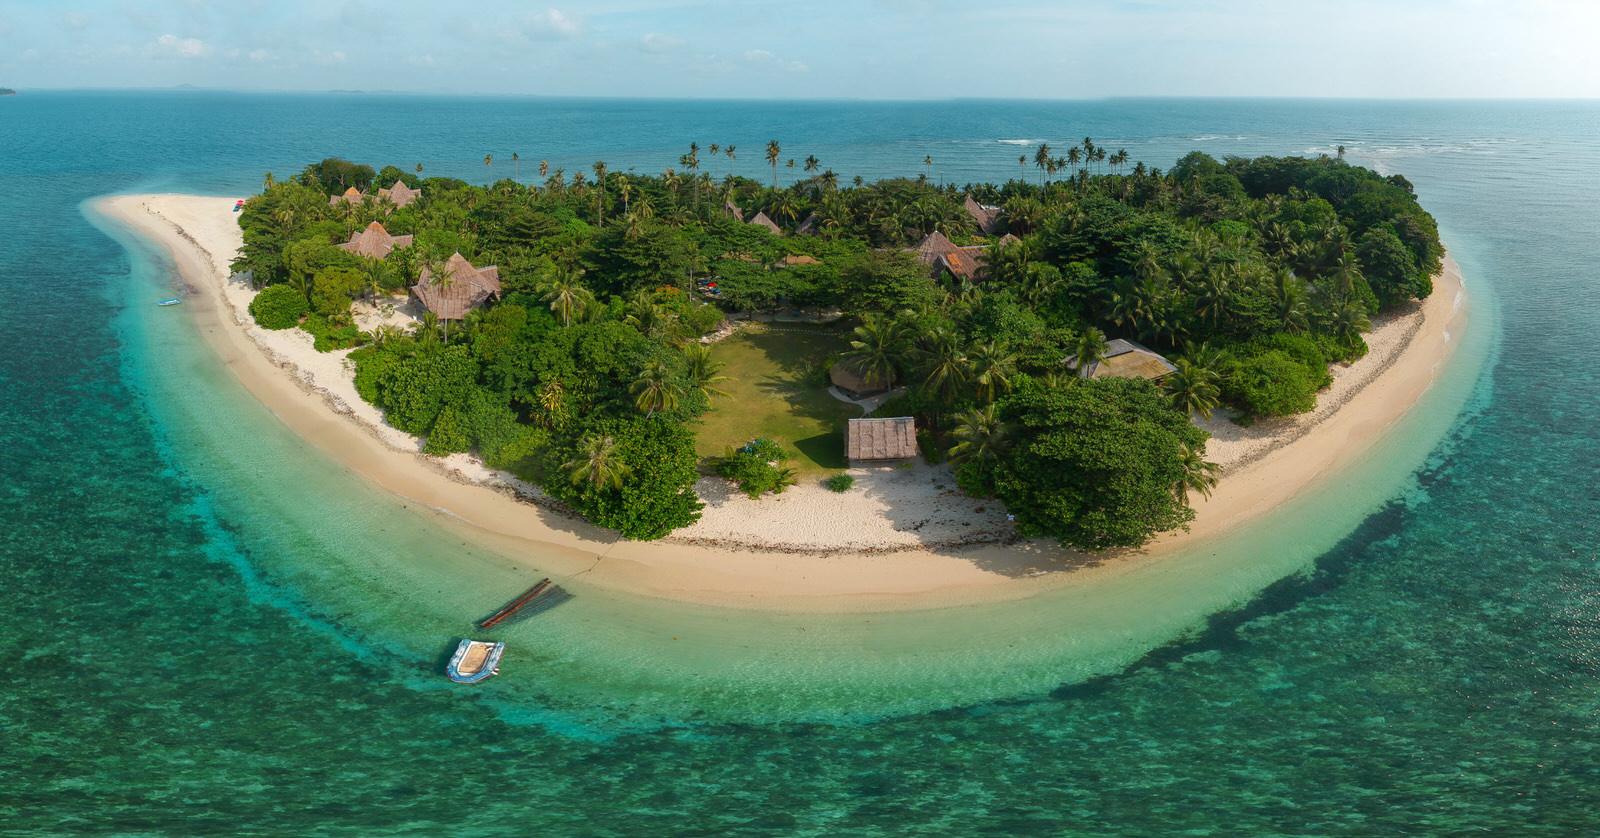 pulau joyo is a private island